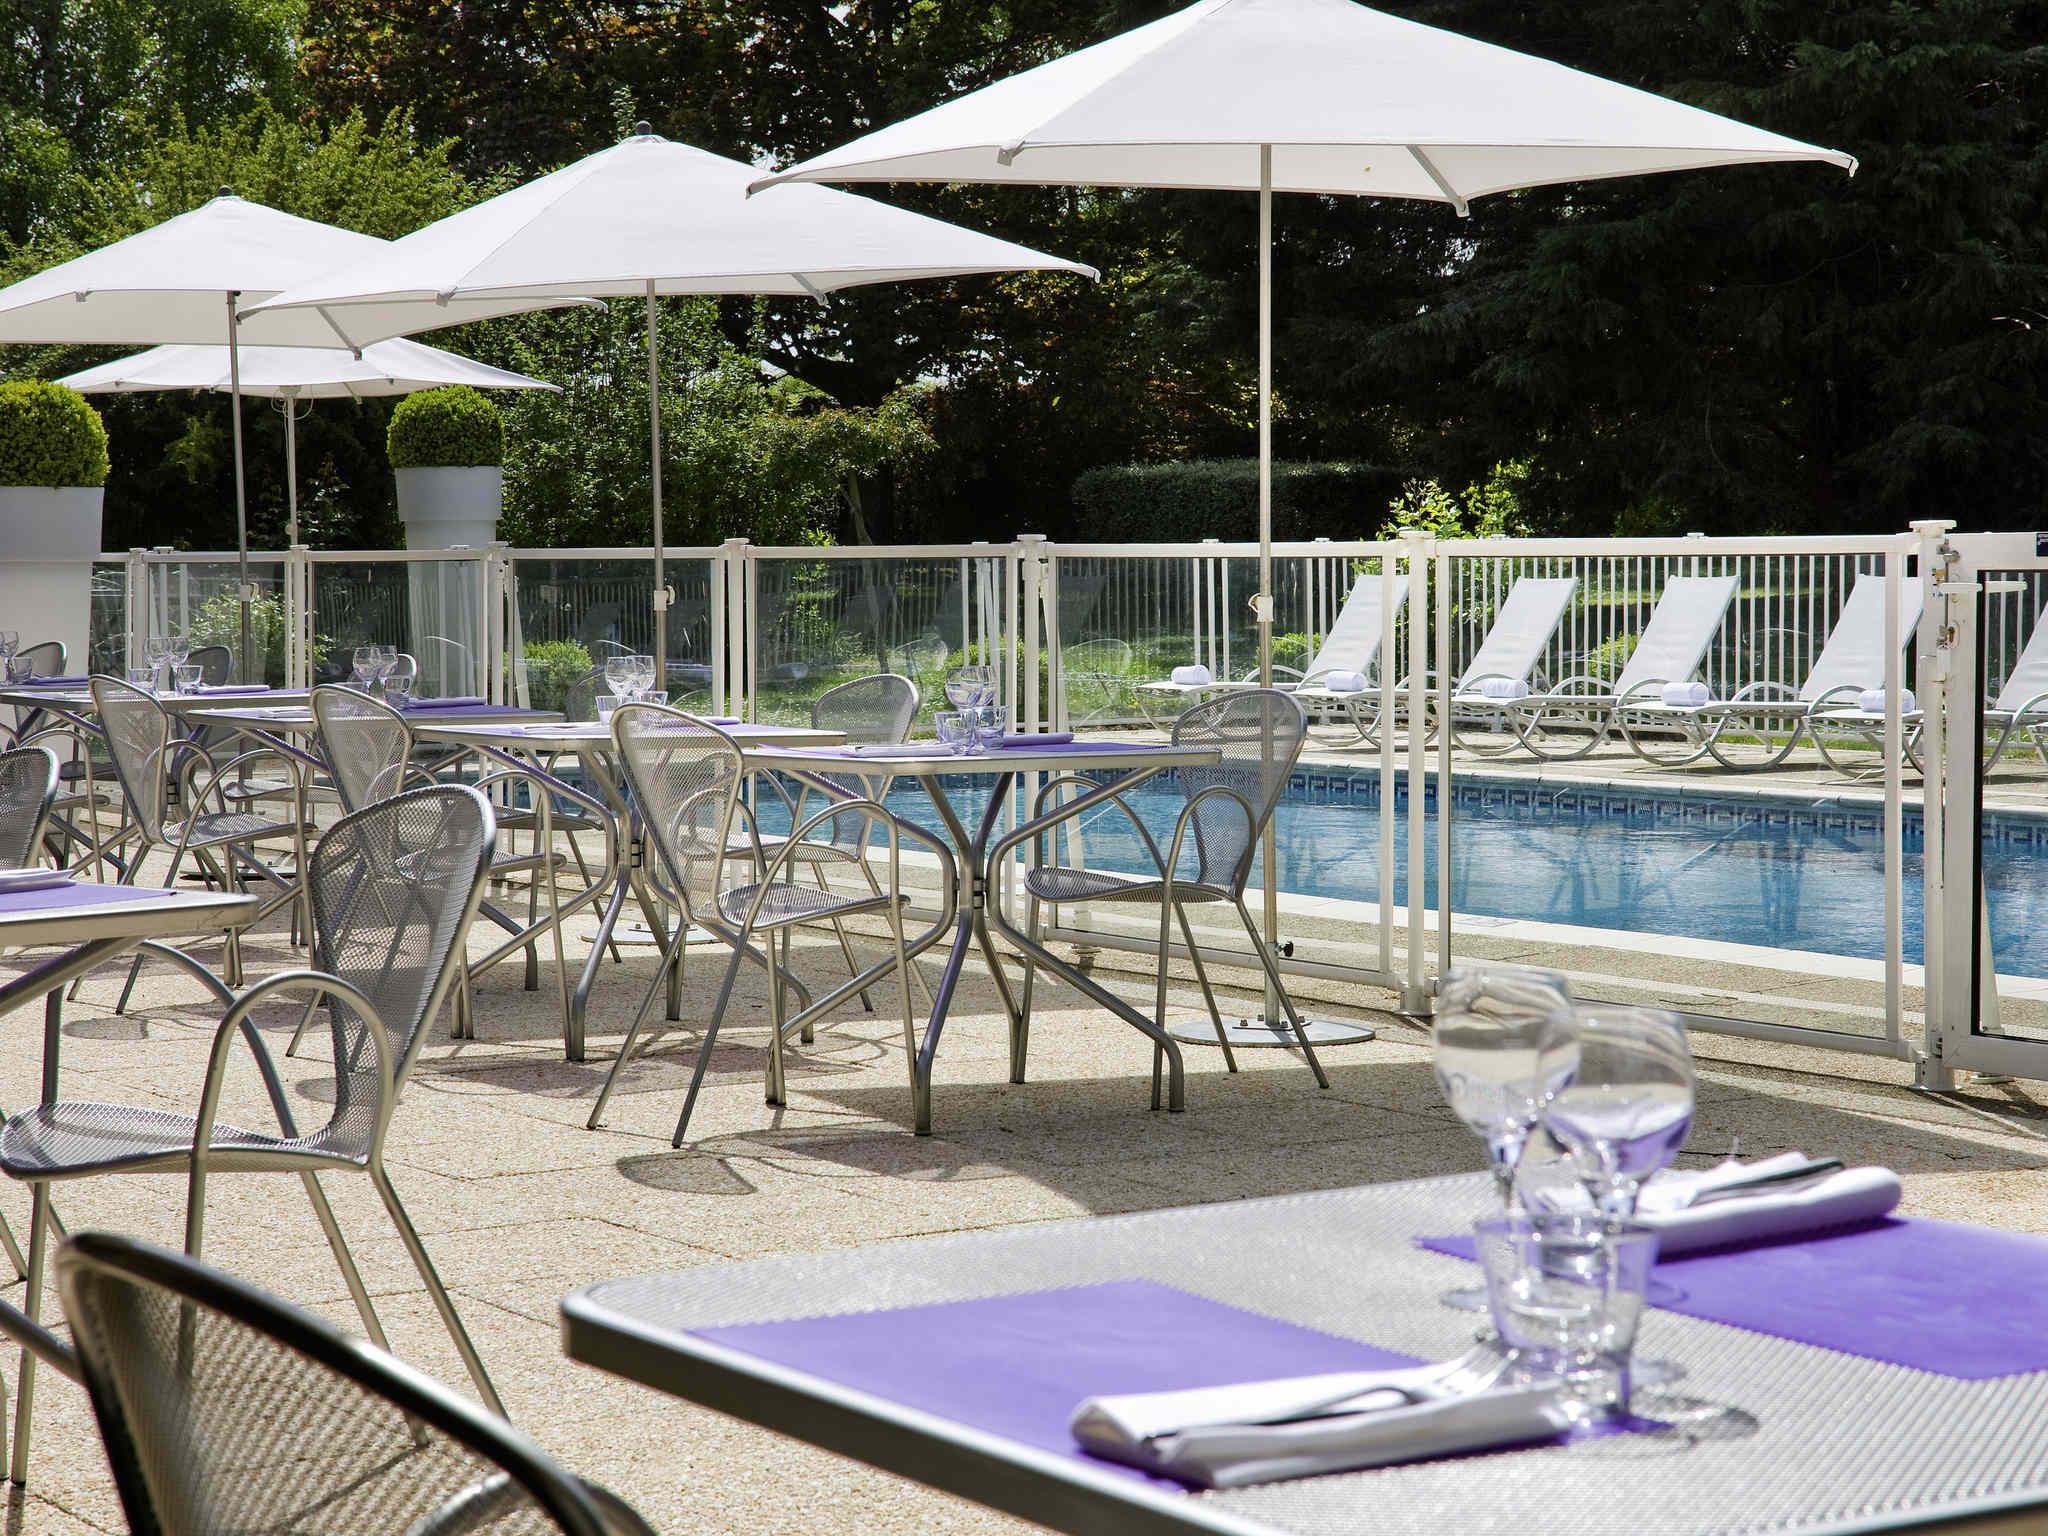 Hotel - Novotel Marne la Vallée Noisy le Grand